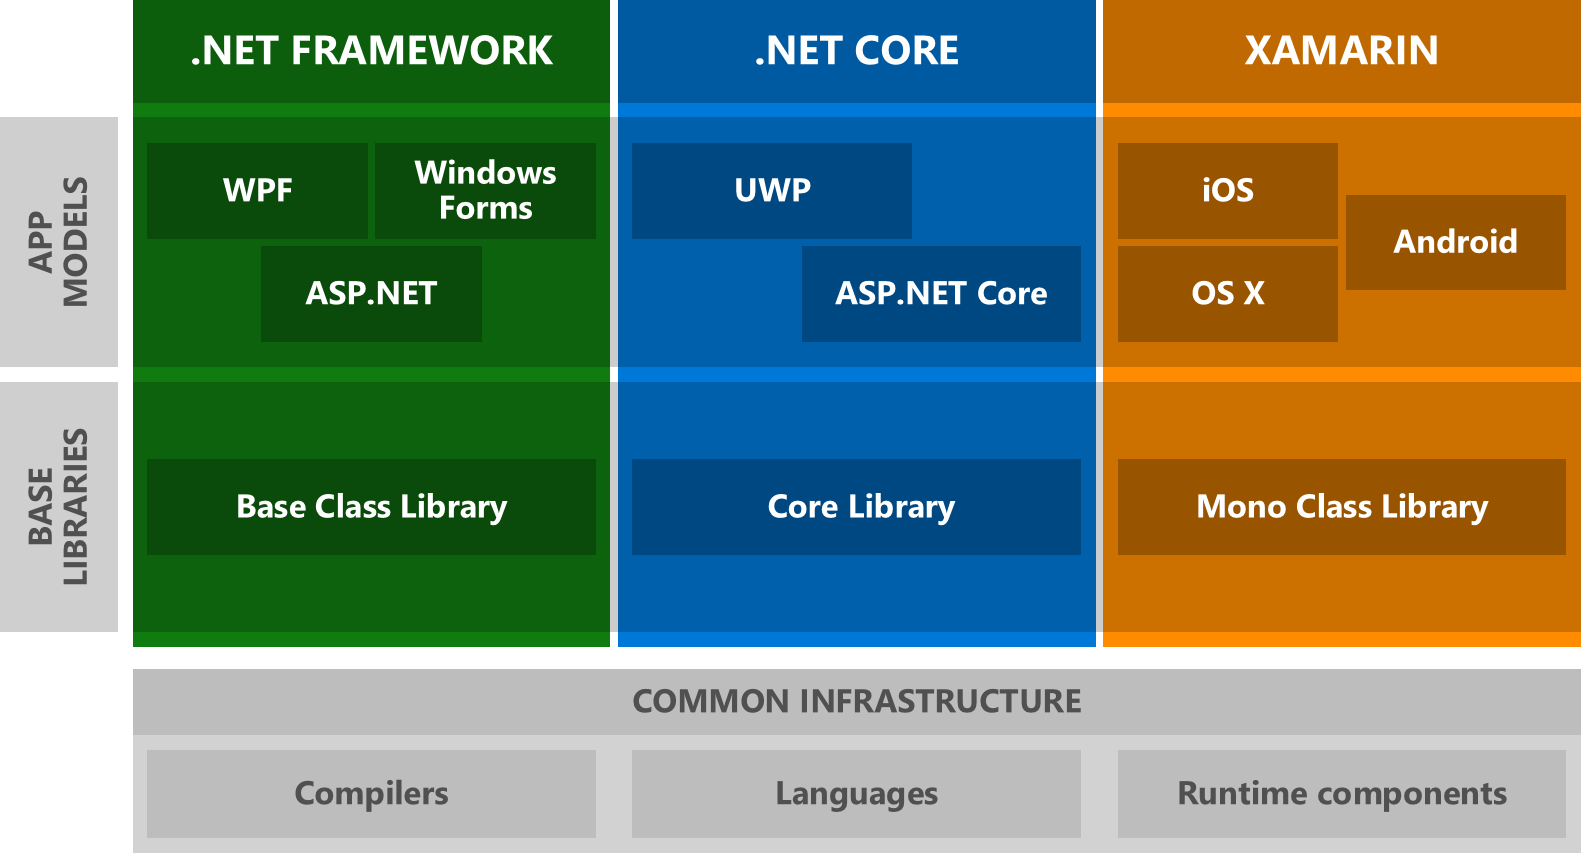 System Threading Thread, Universal Windows Platform, and the